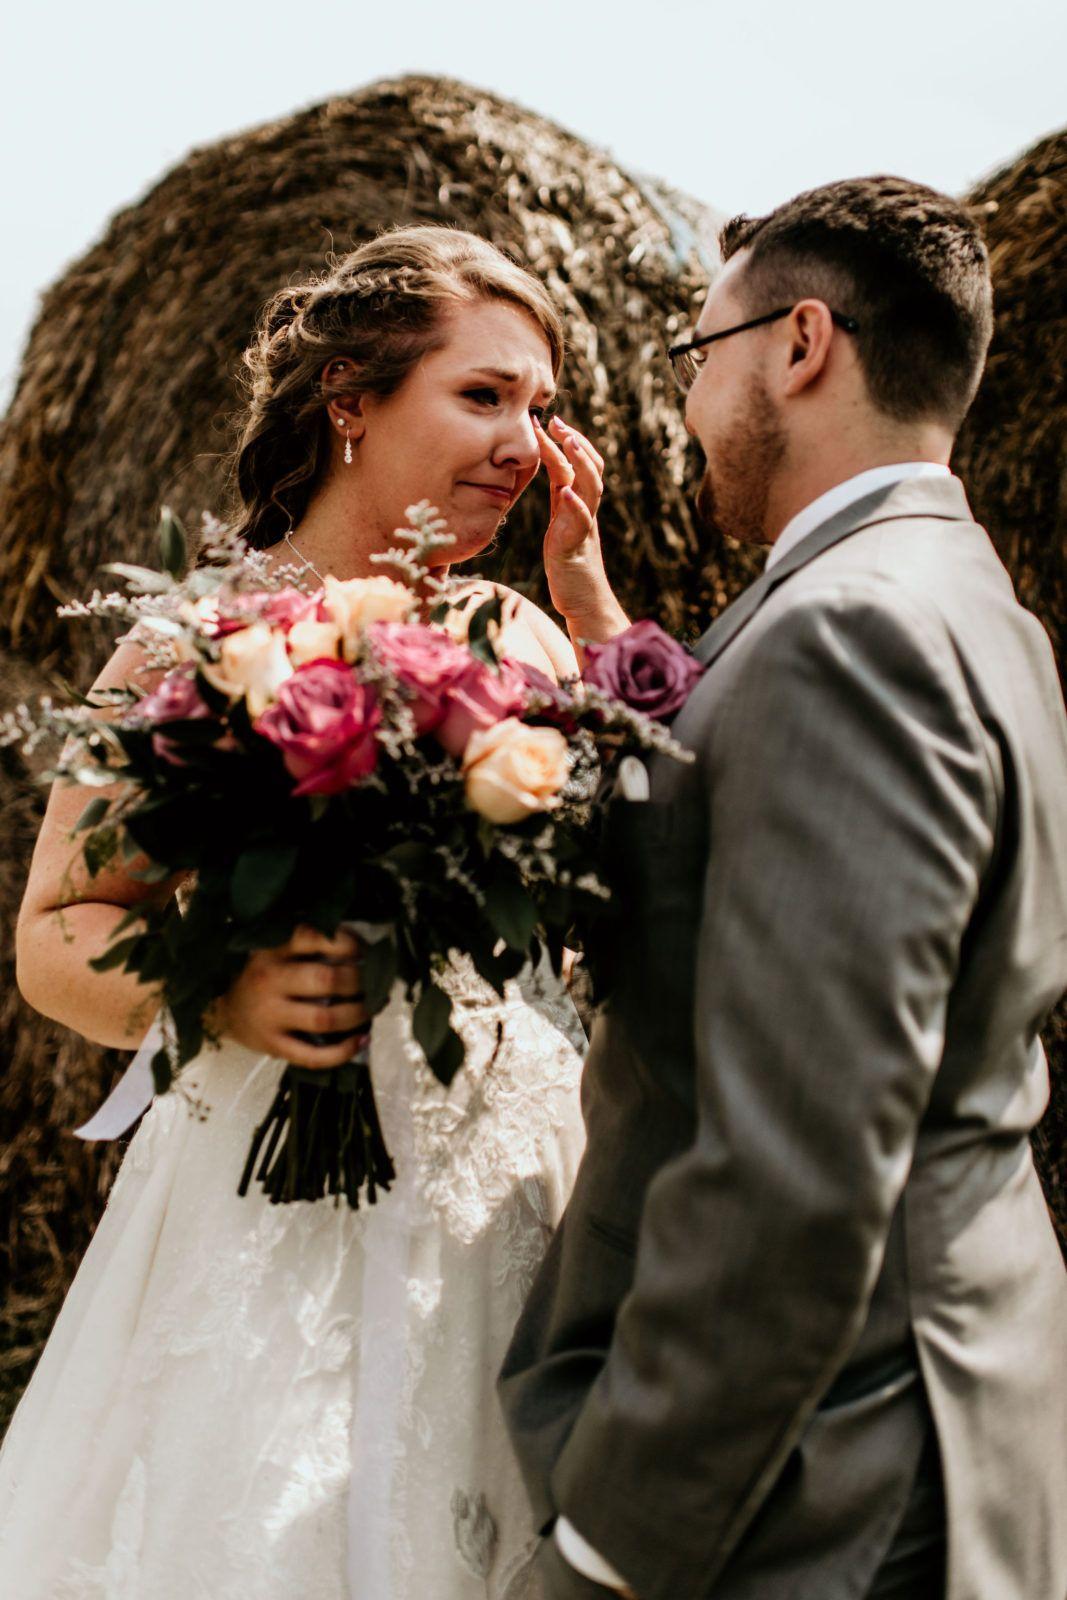 Conklin's Barn Wedding Illinois | Wedding scene, Planning ...